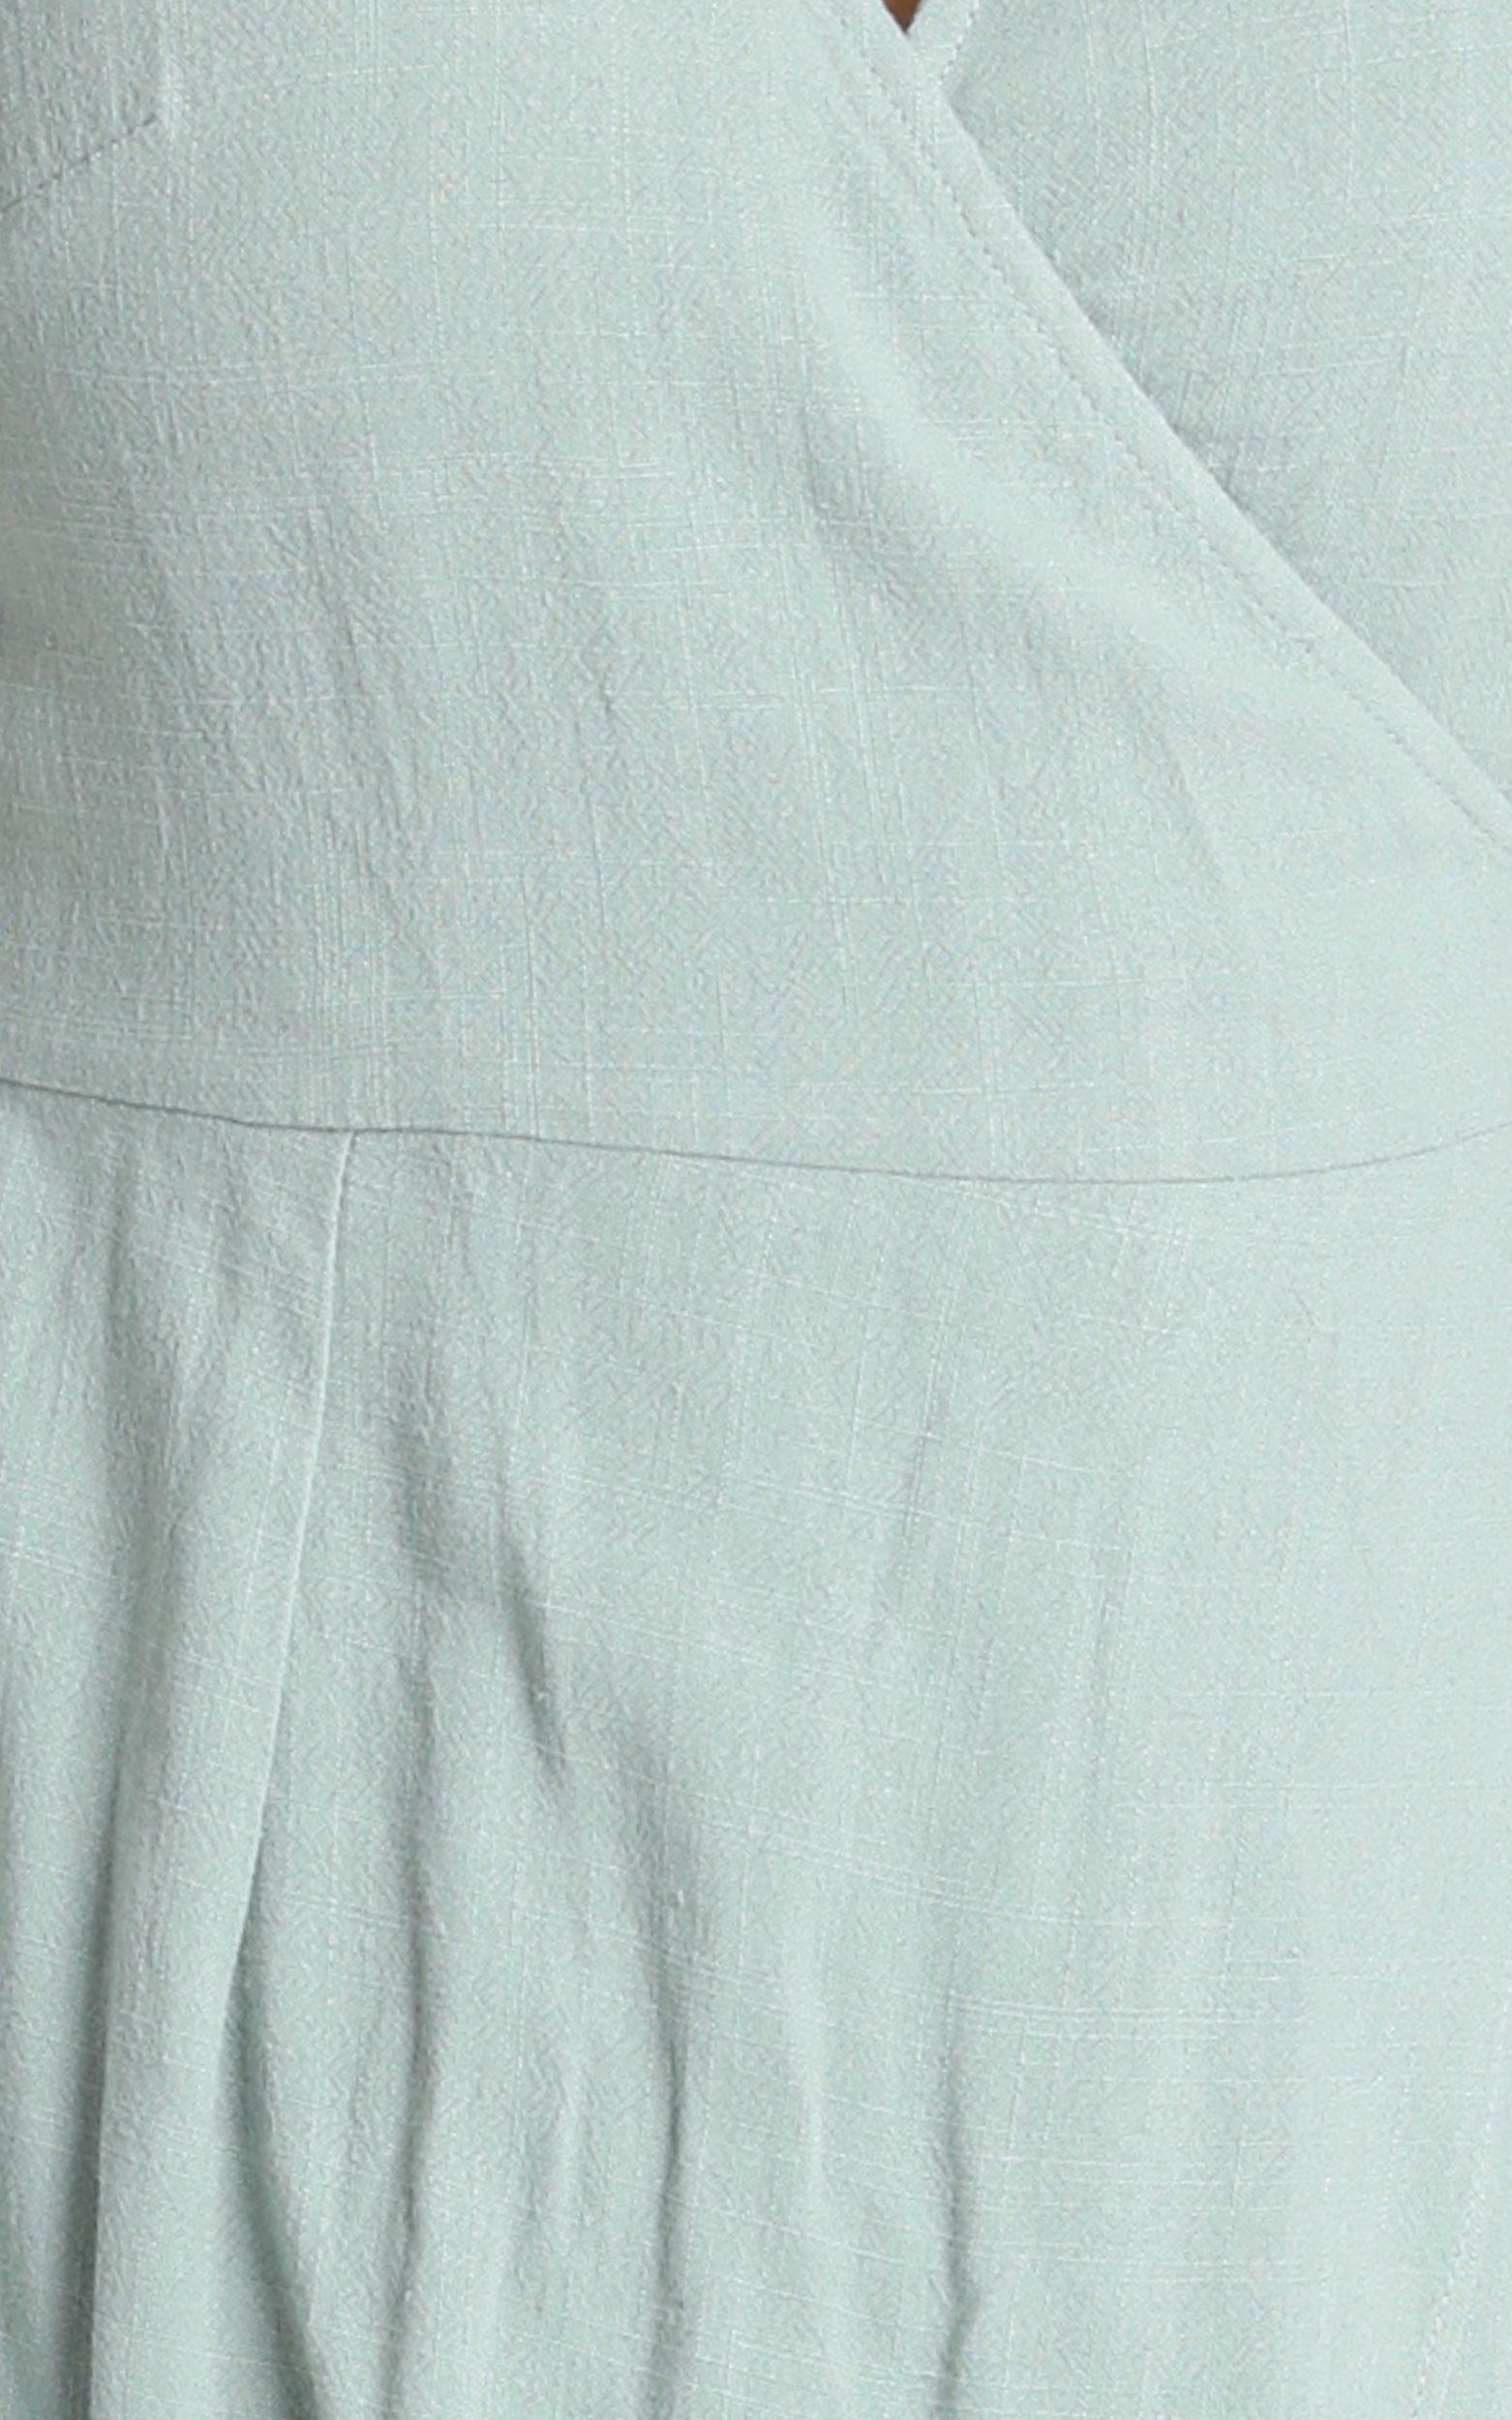 World Of Dream Dress in sage - 14 (XL), Sage, hi-res image number null